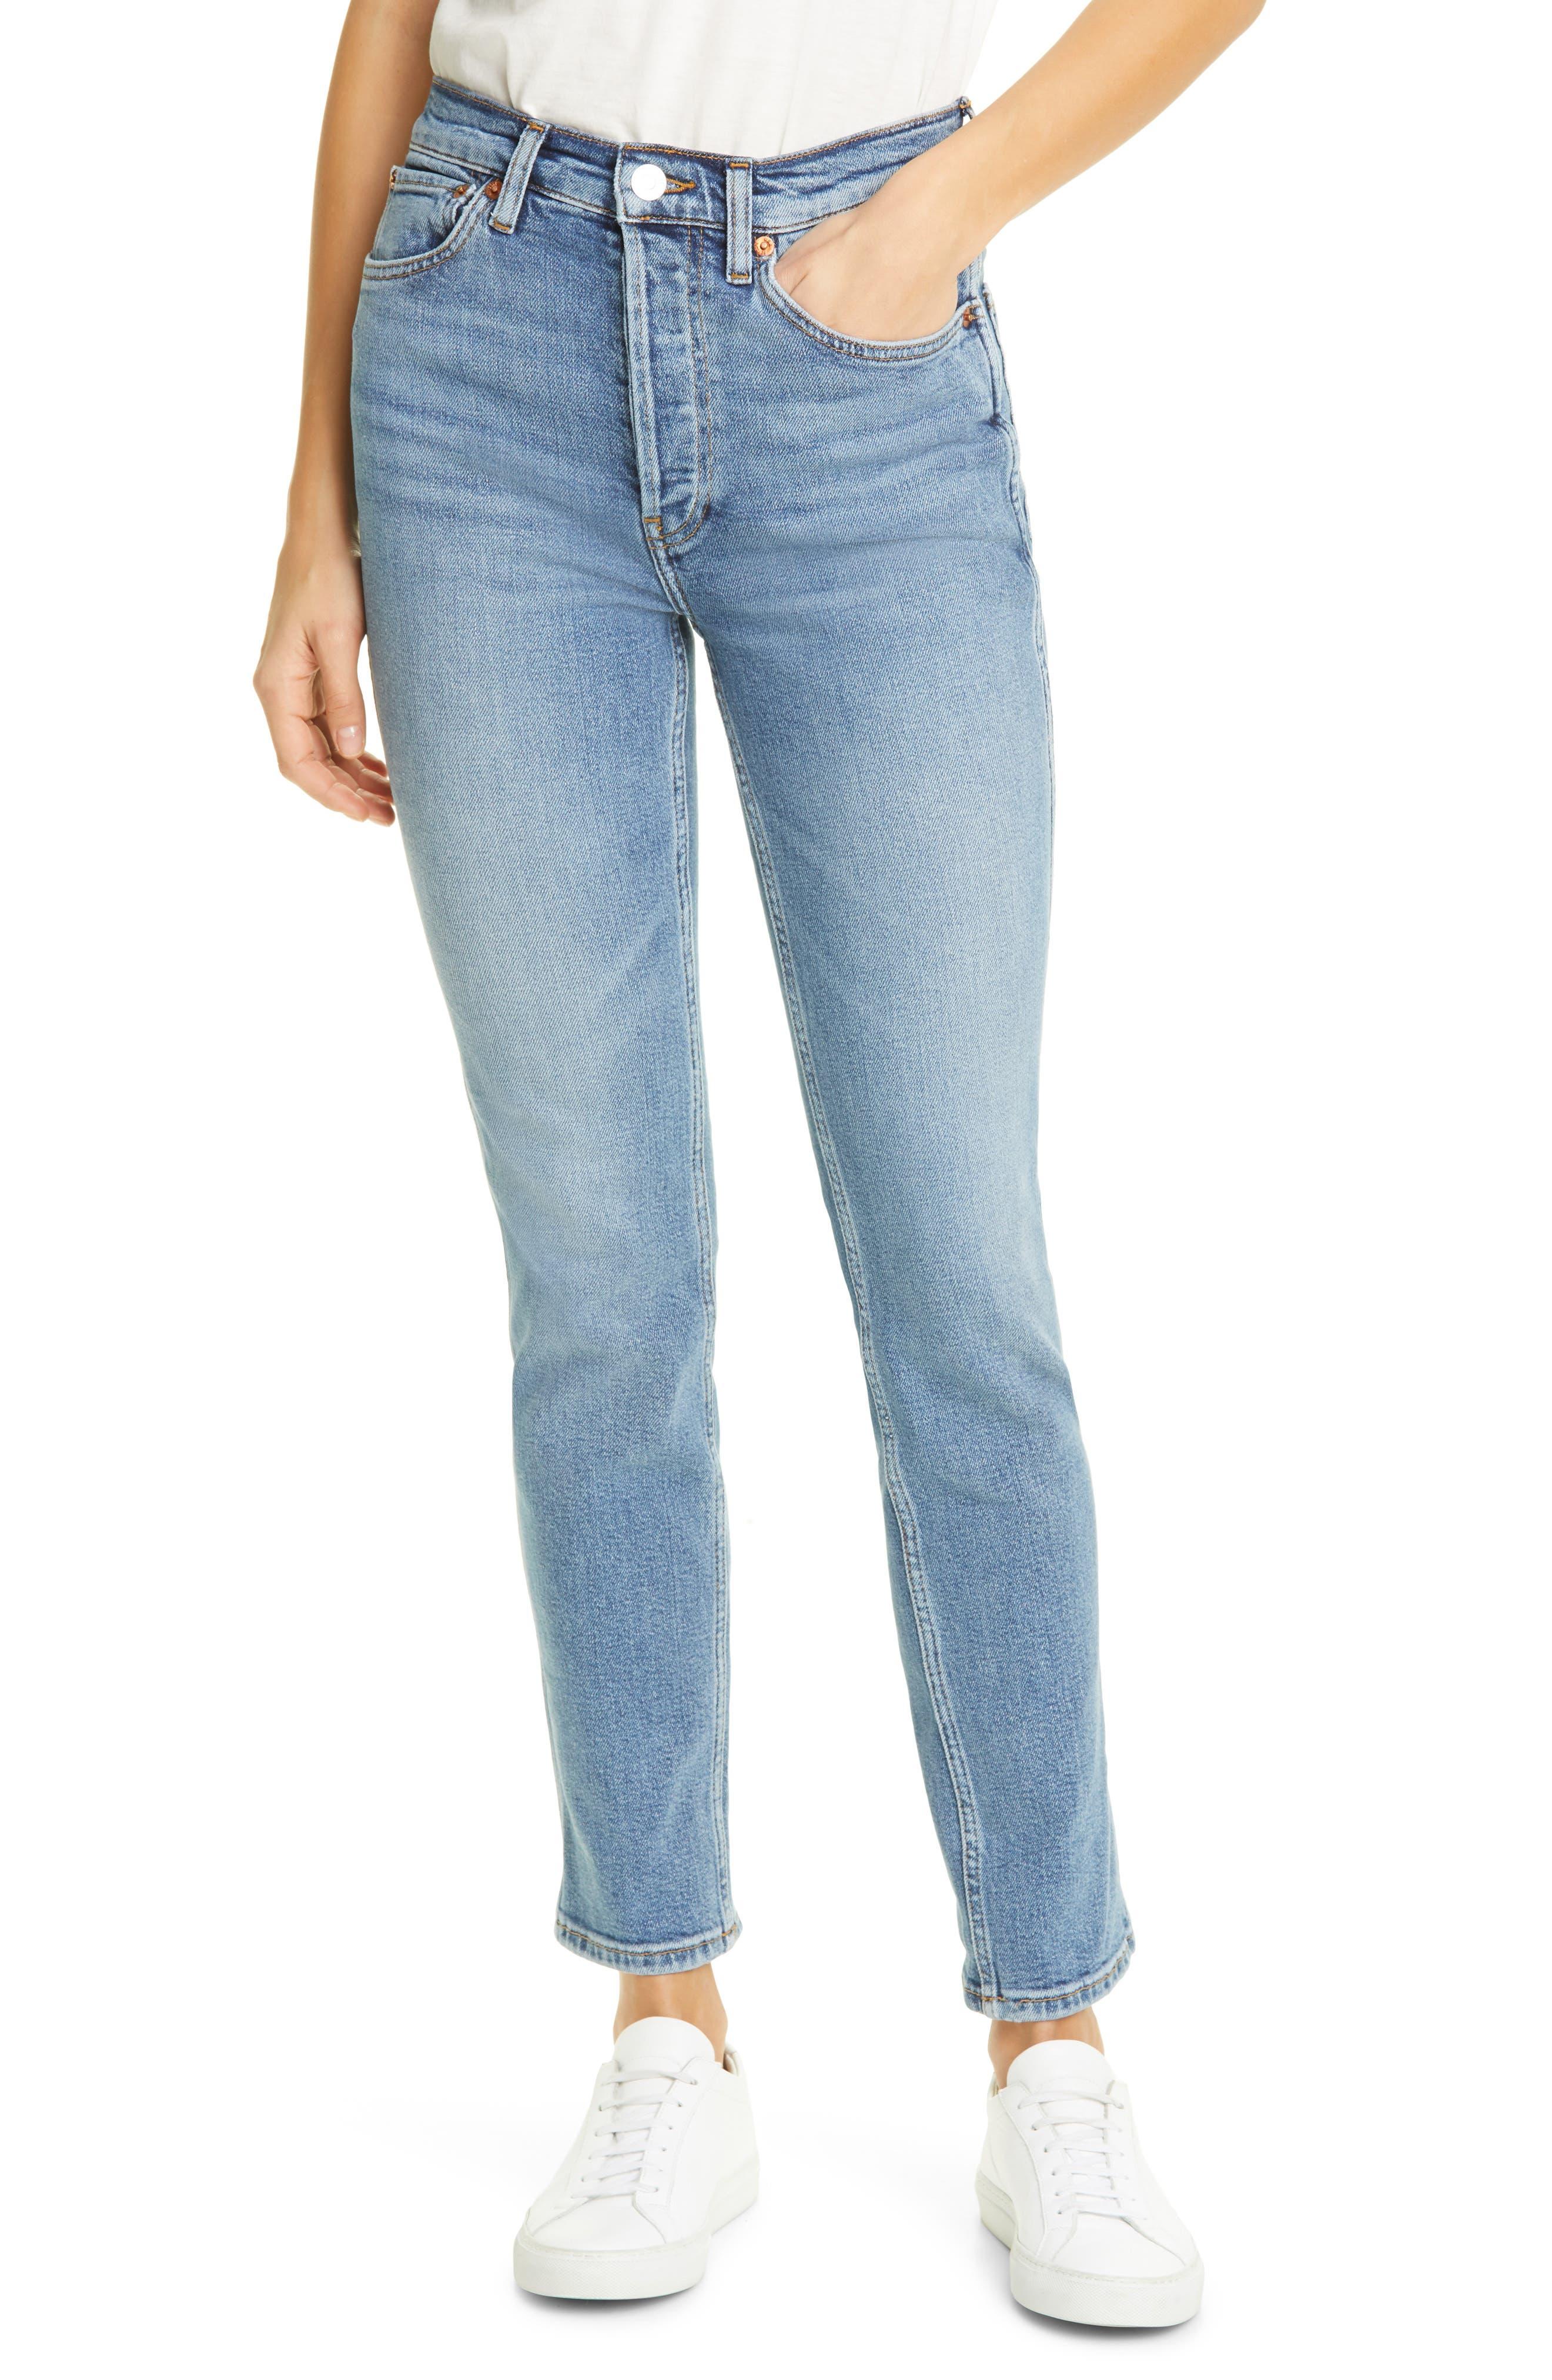 80s Jeans, Pants, Leggings Womens Redone 80S High Waist Slim Straight Leg Jeans $250.00 AT vintagedancer.com